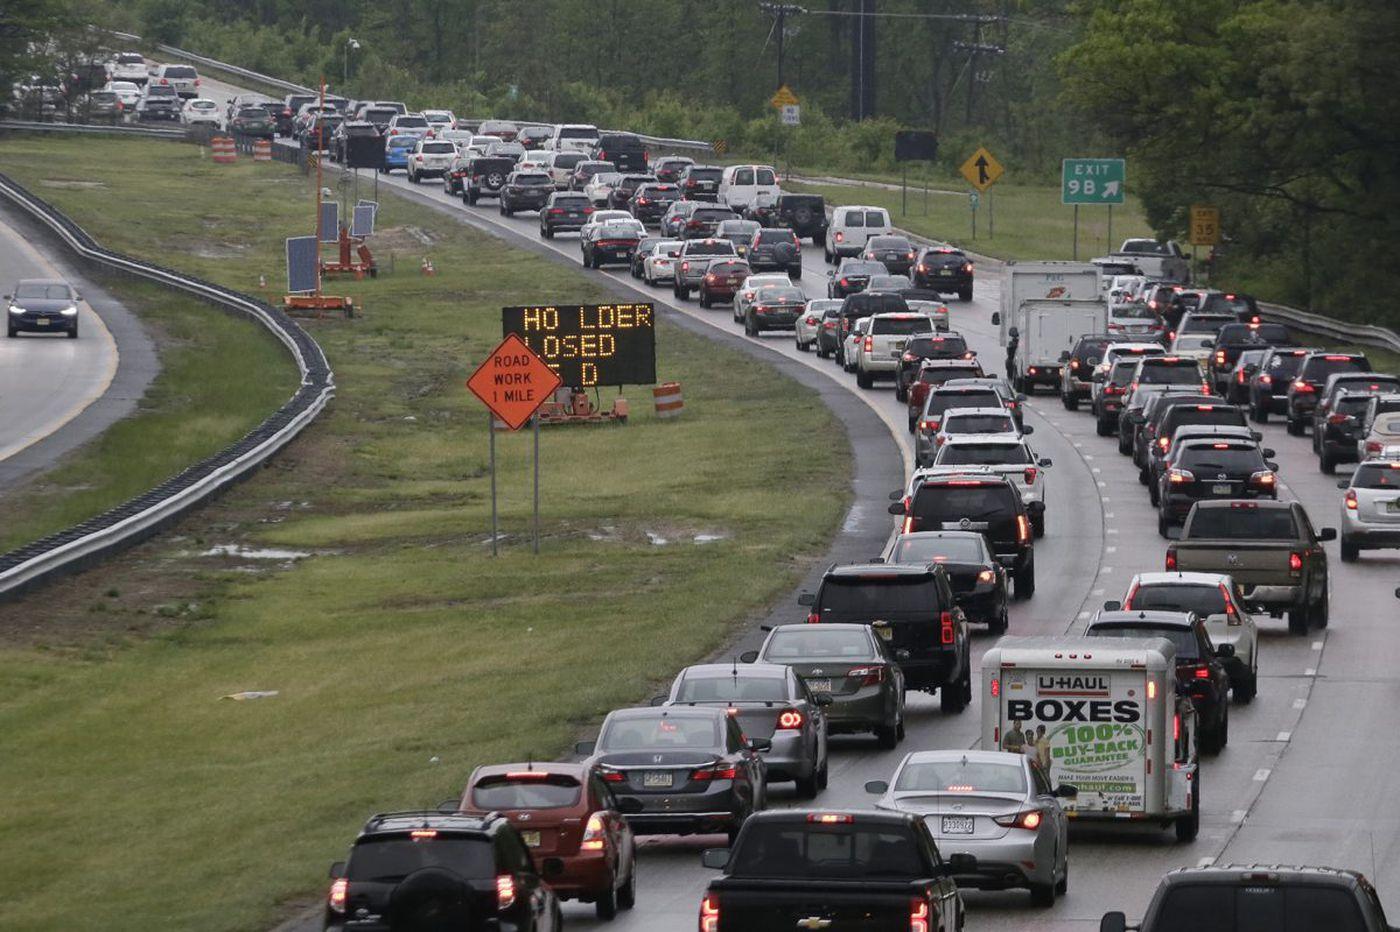 Jersey Shore travel alert: traffic jams await. And it starts now